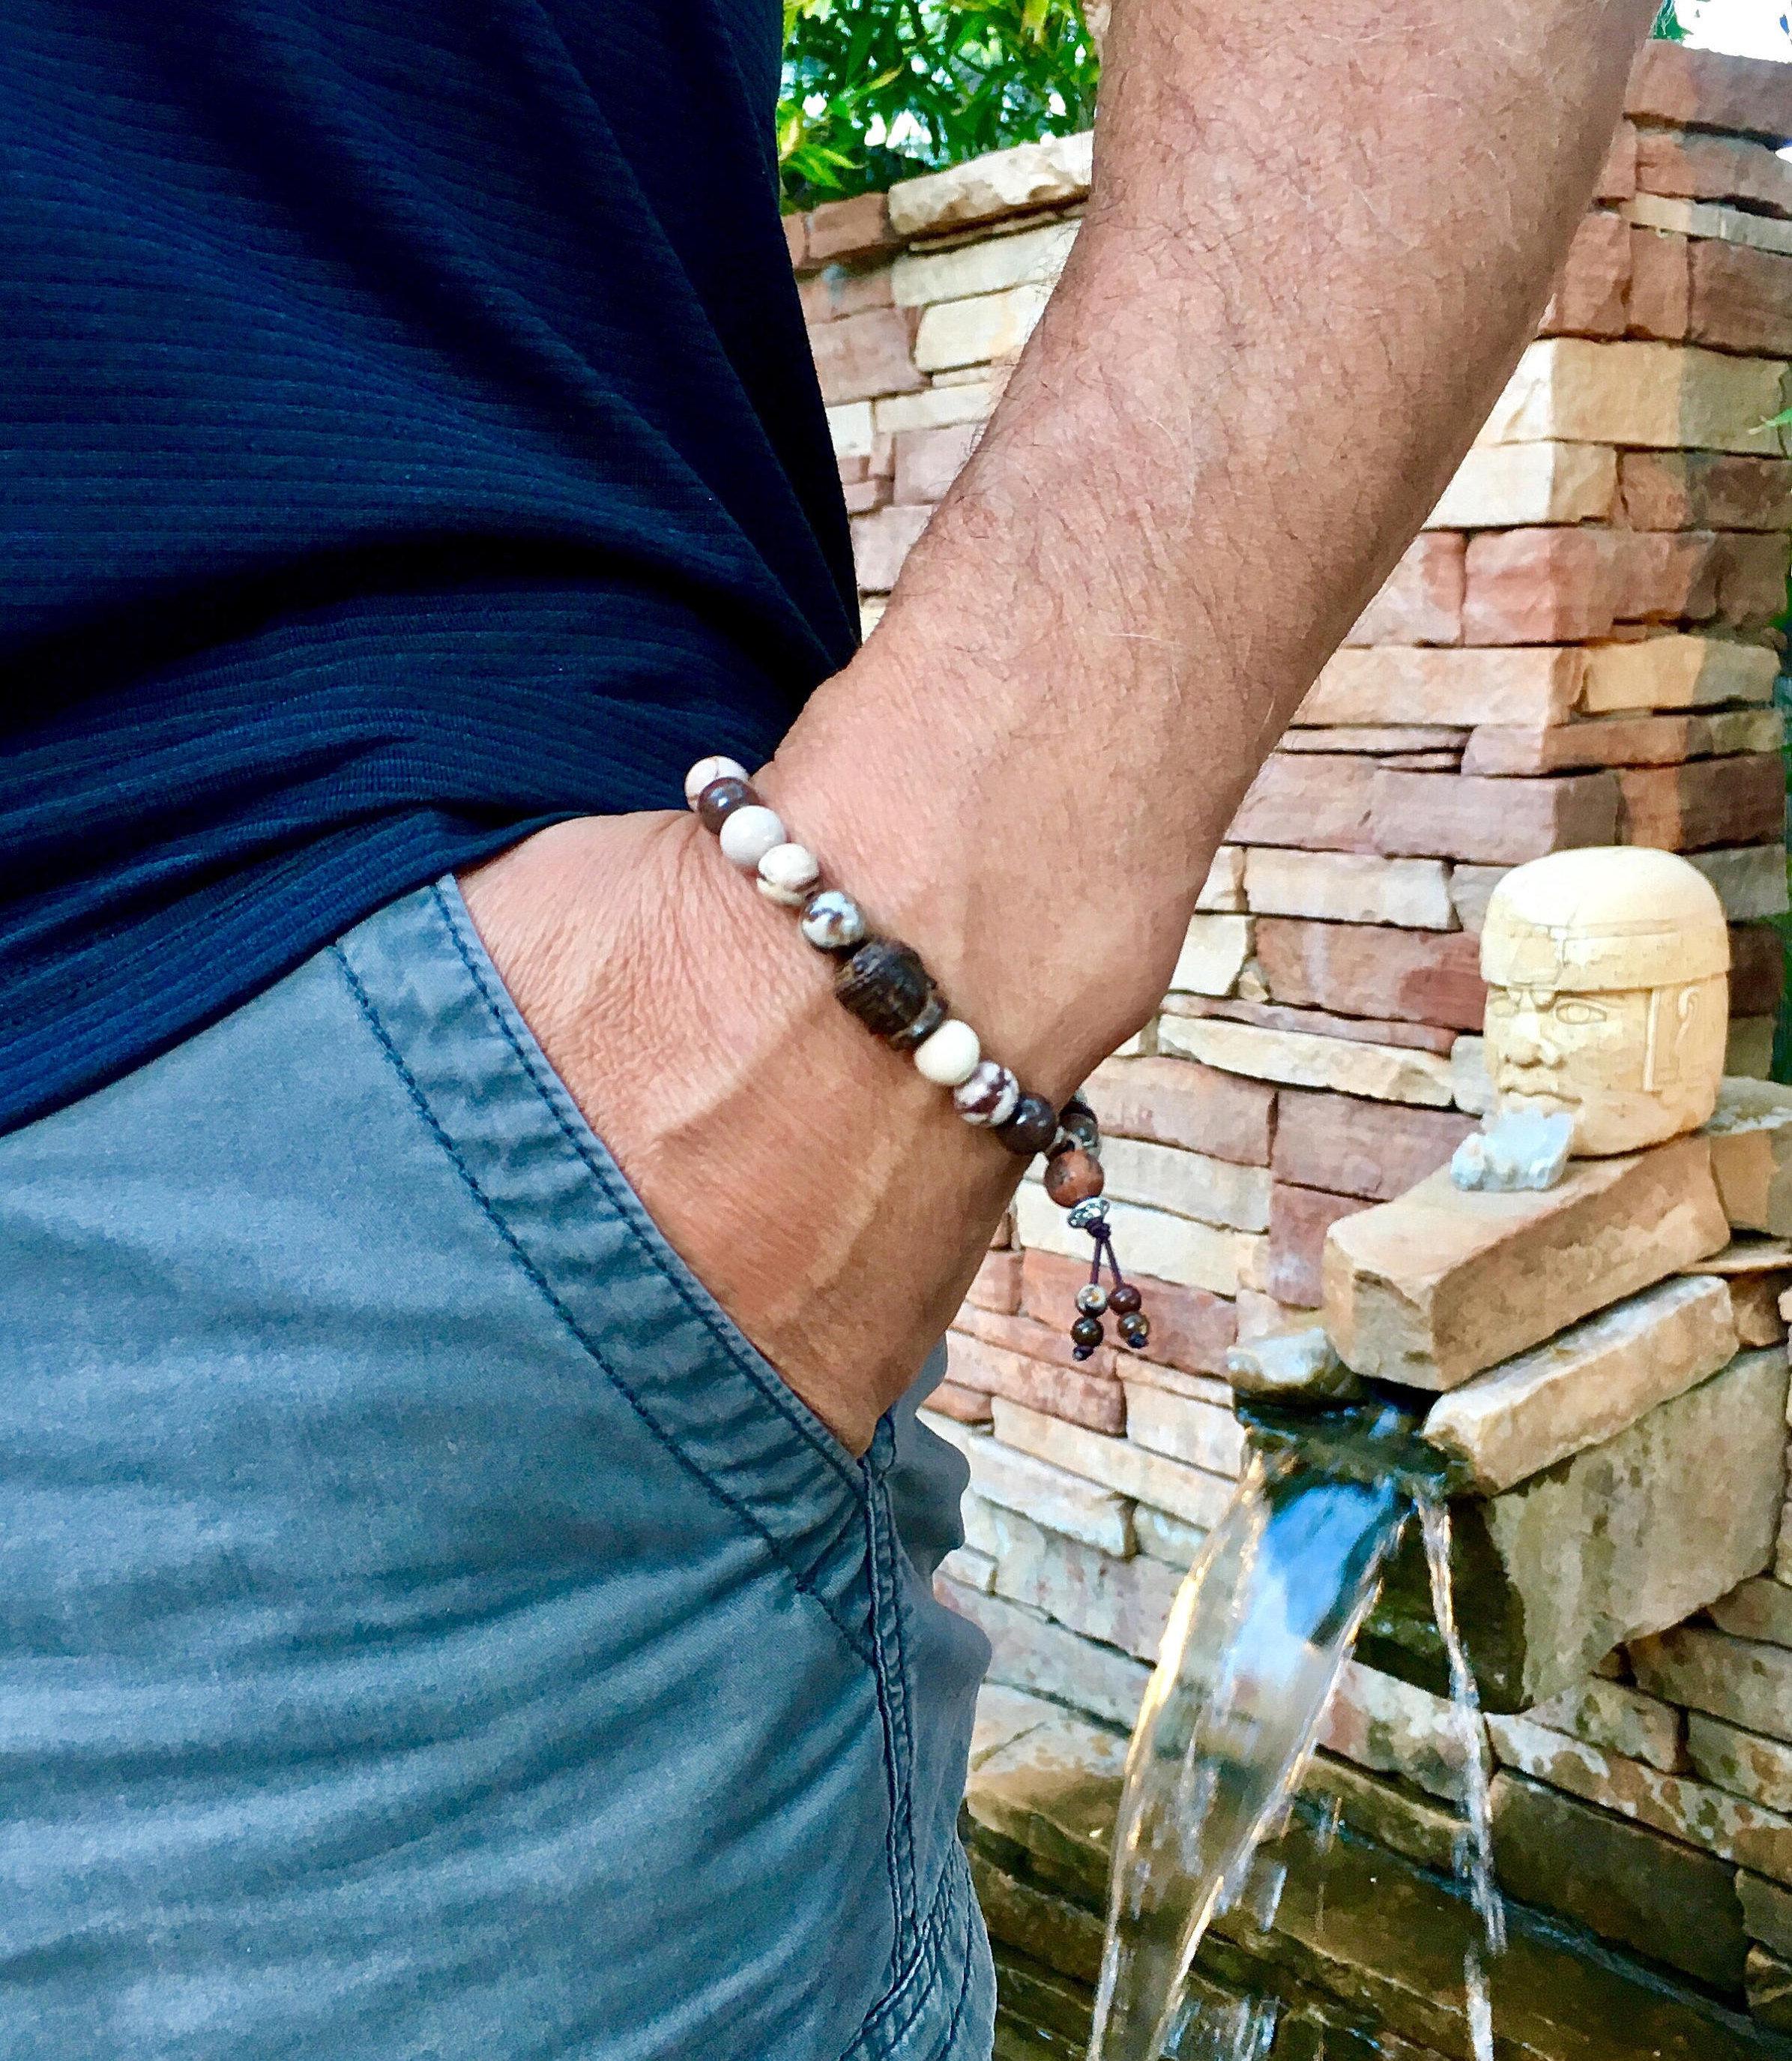 Gem Series 4018 With Zebrawood From: Men's Health & Balance Mala Bracelet